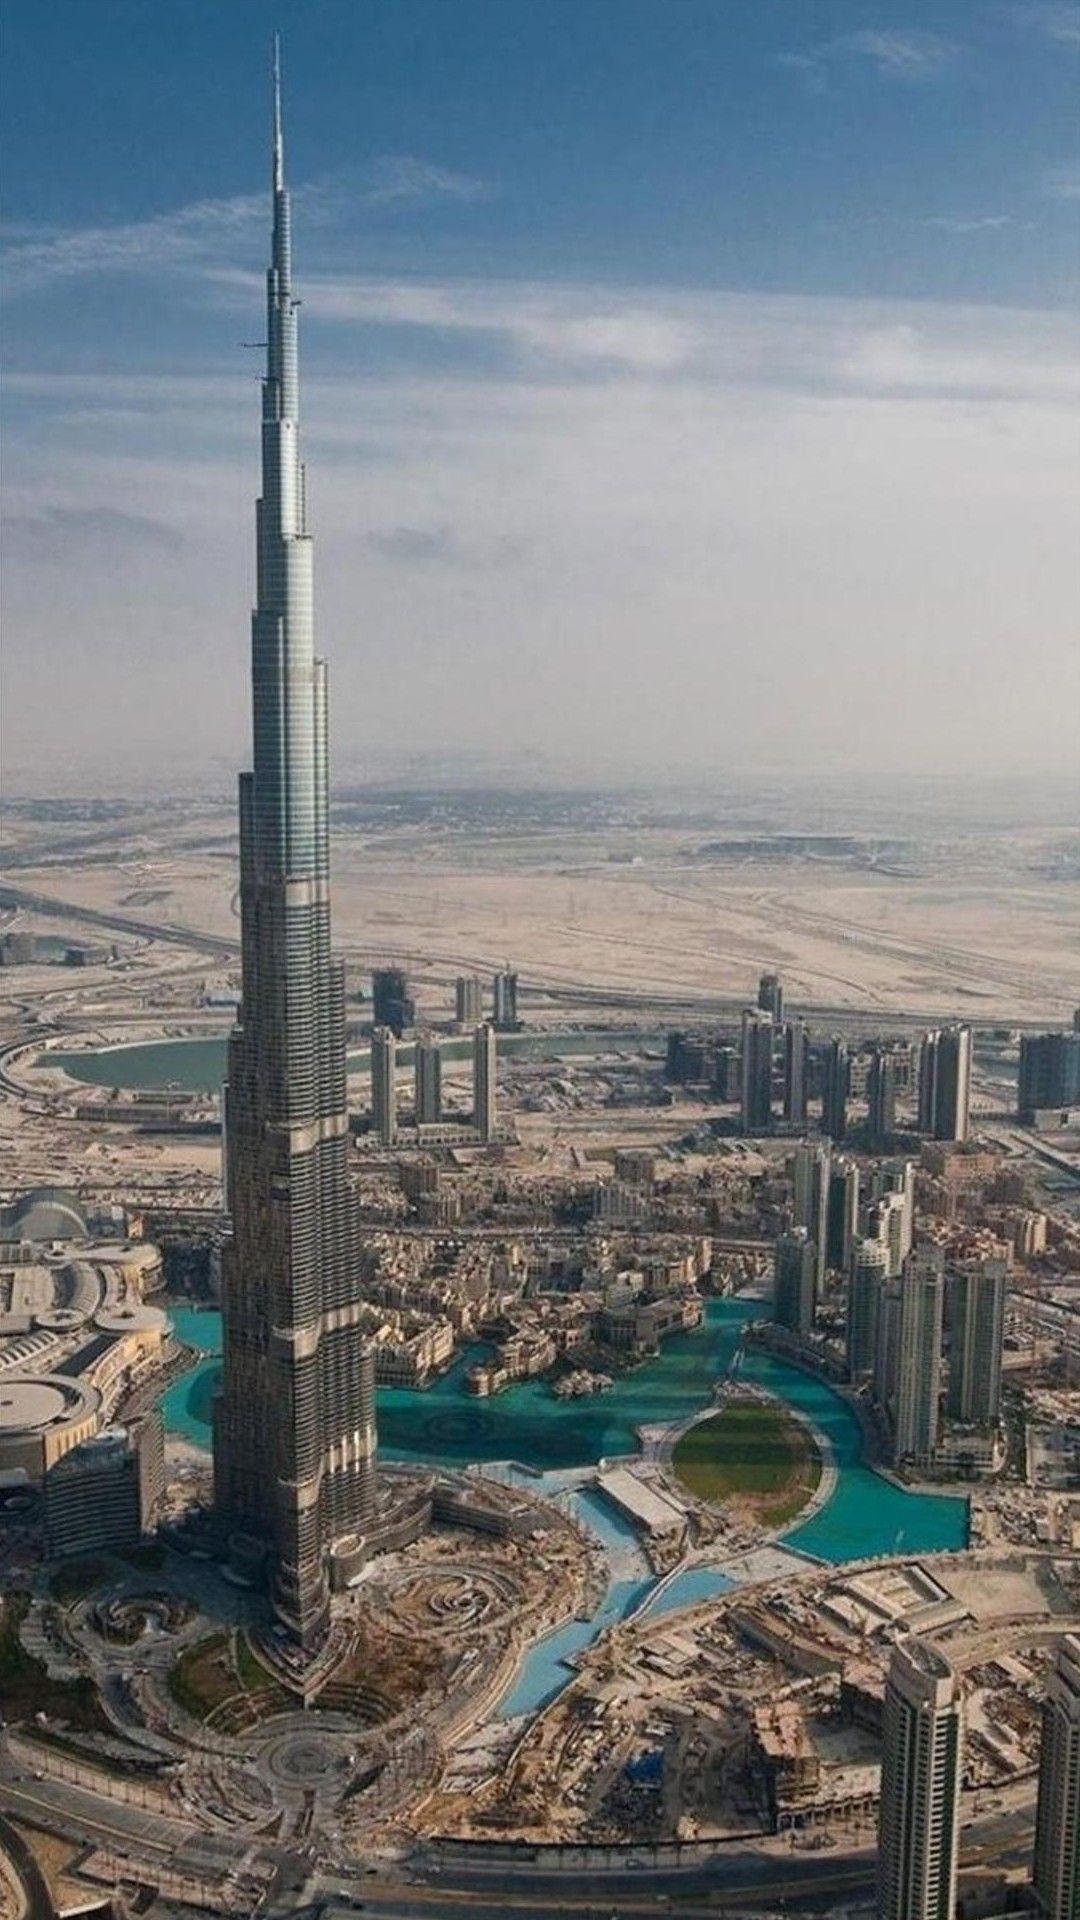 60 most downloaded architecture iphone wallpapers fondos - Dubai burj khalifa hd wallpaper ...